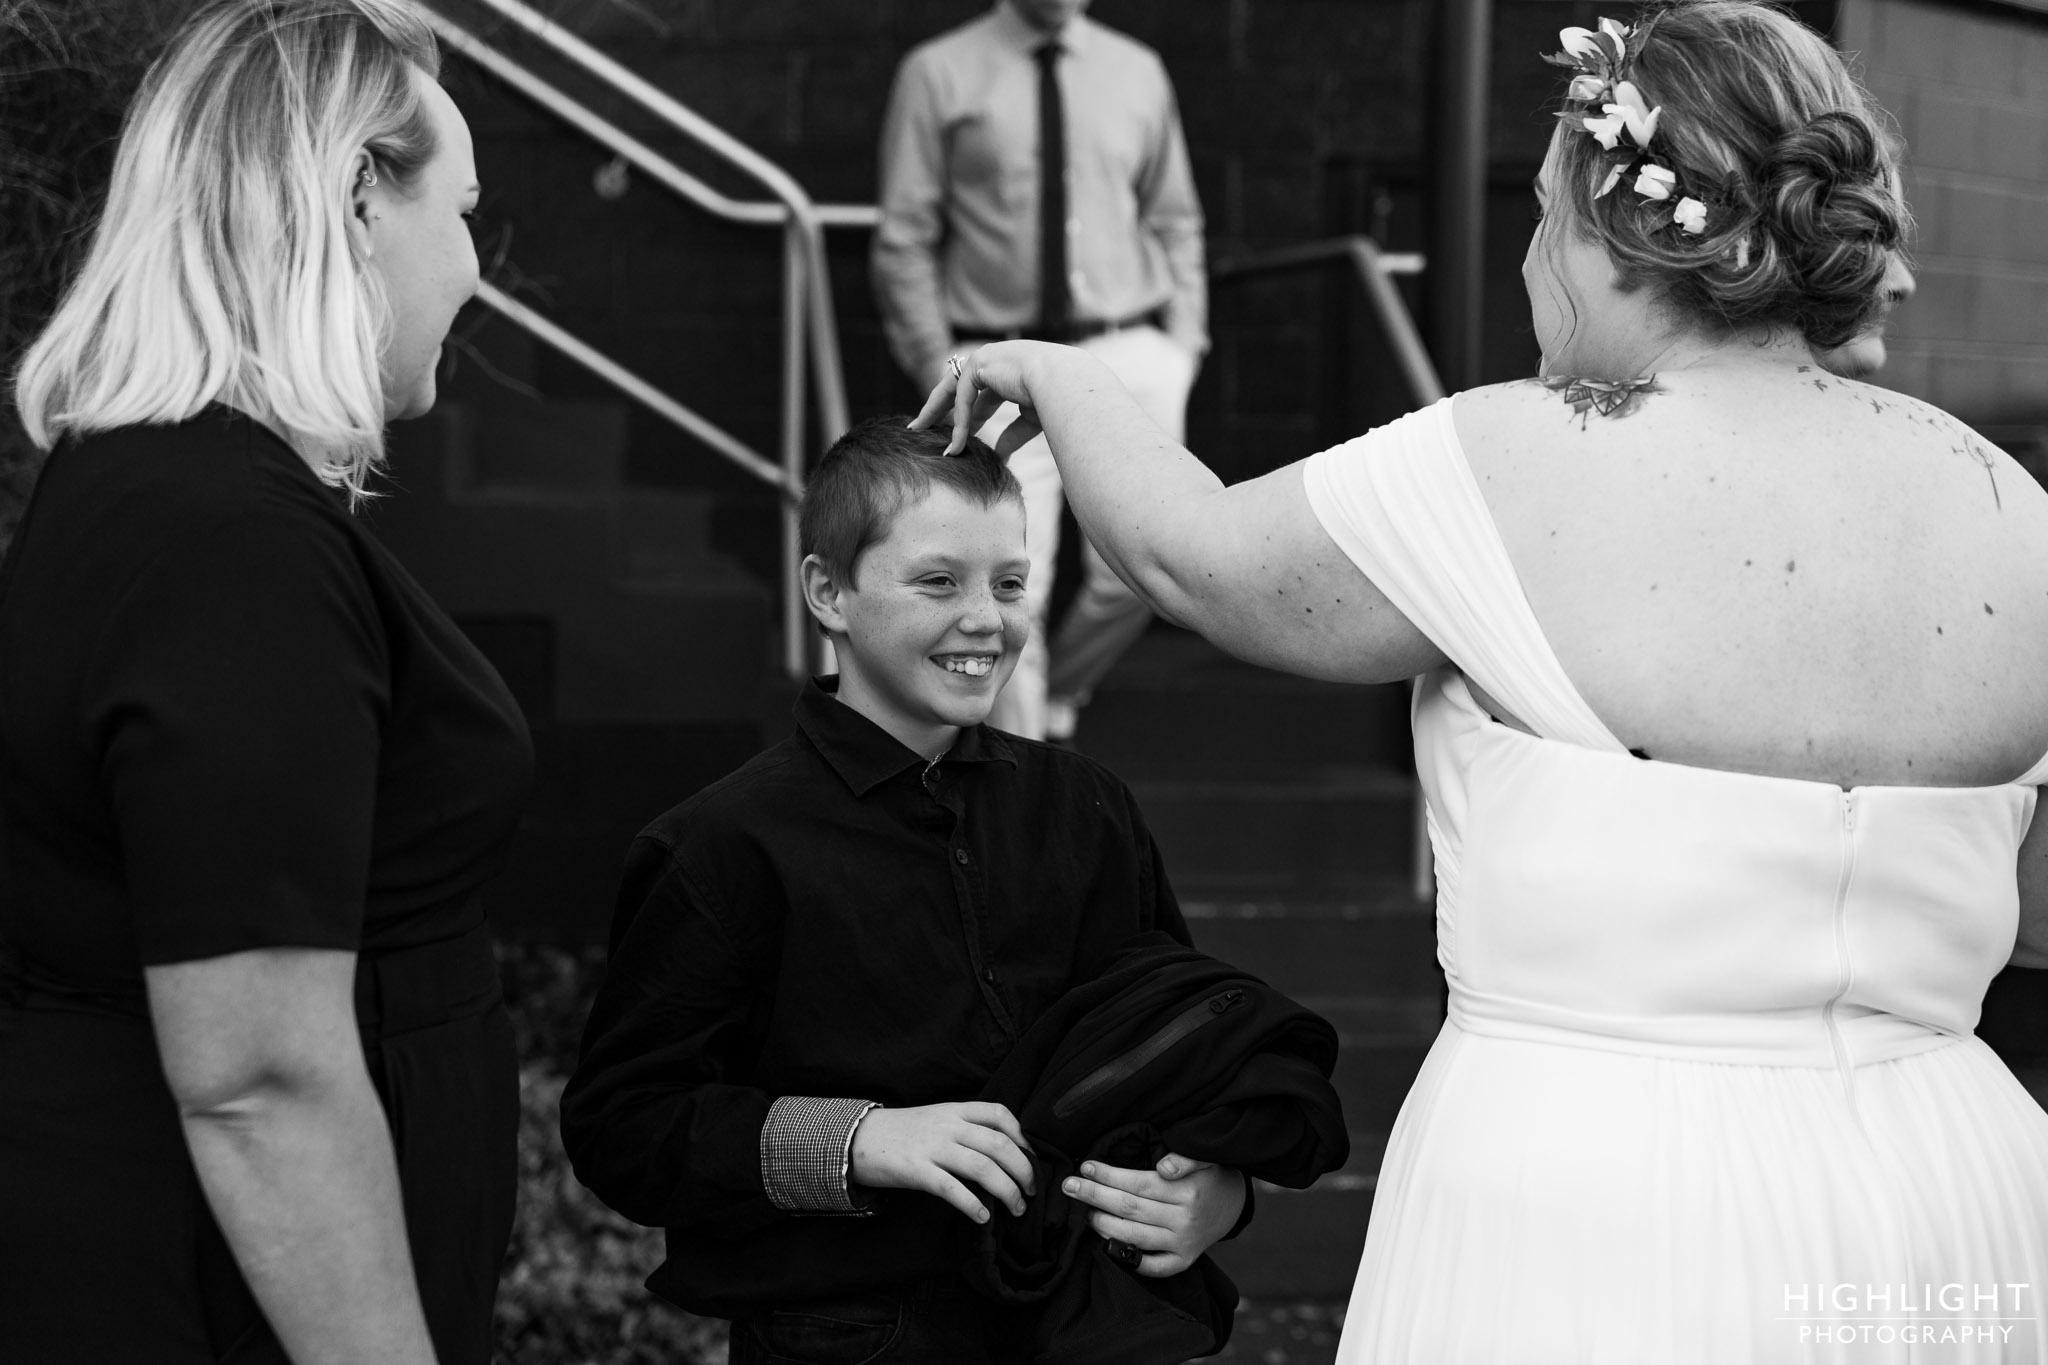 Highlight-wedding-photography-new-zealand-palmerston-north-63.jpg